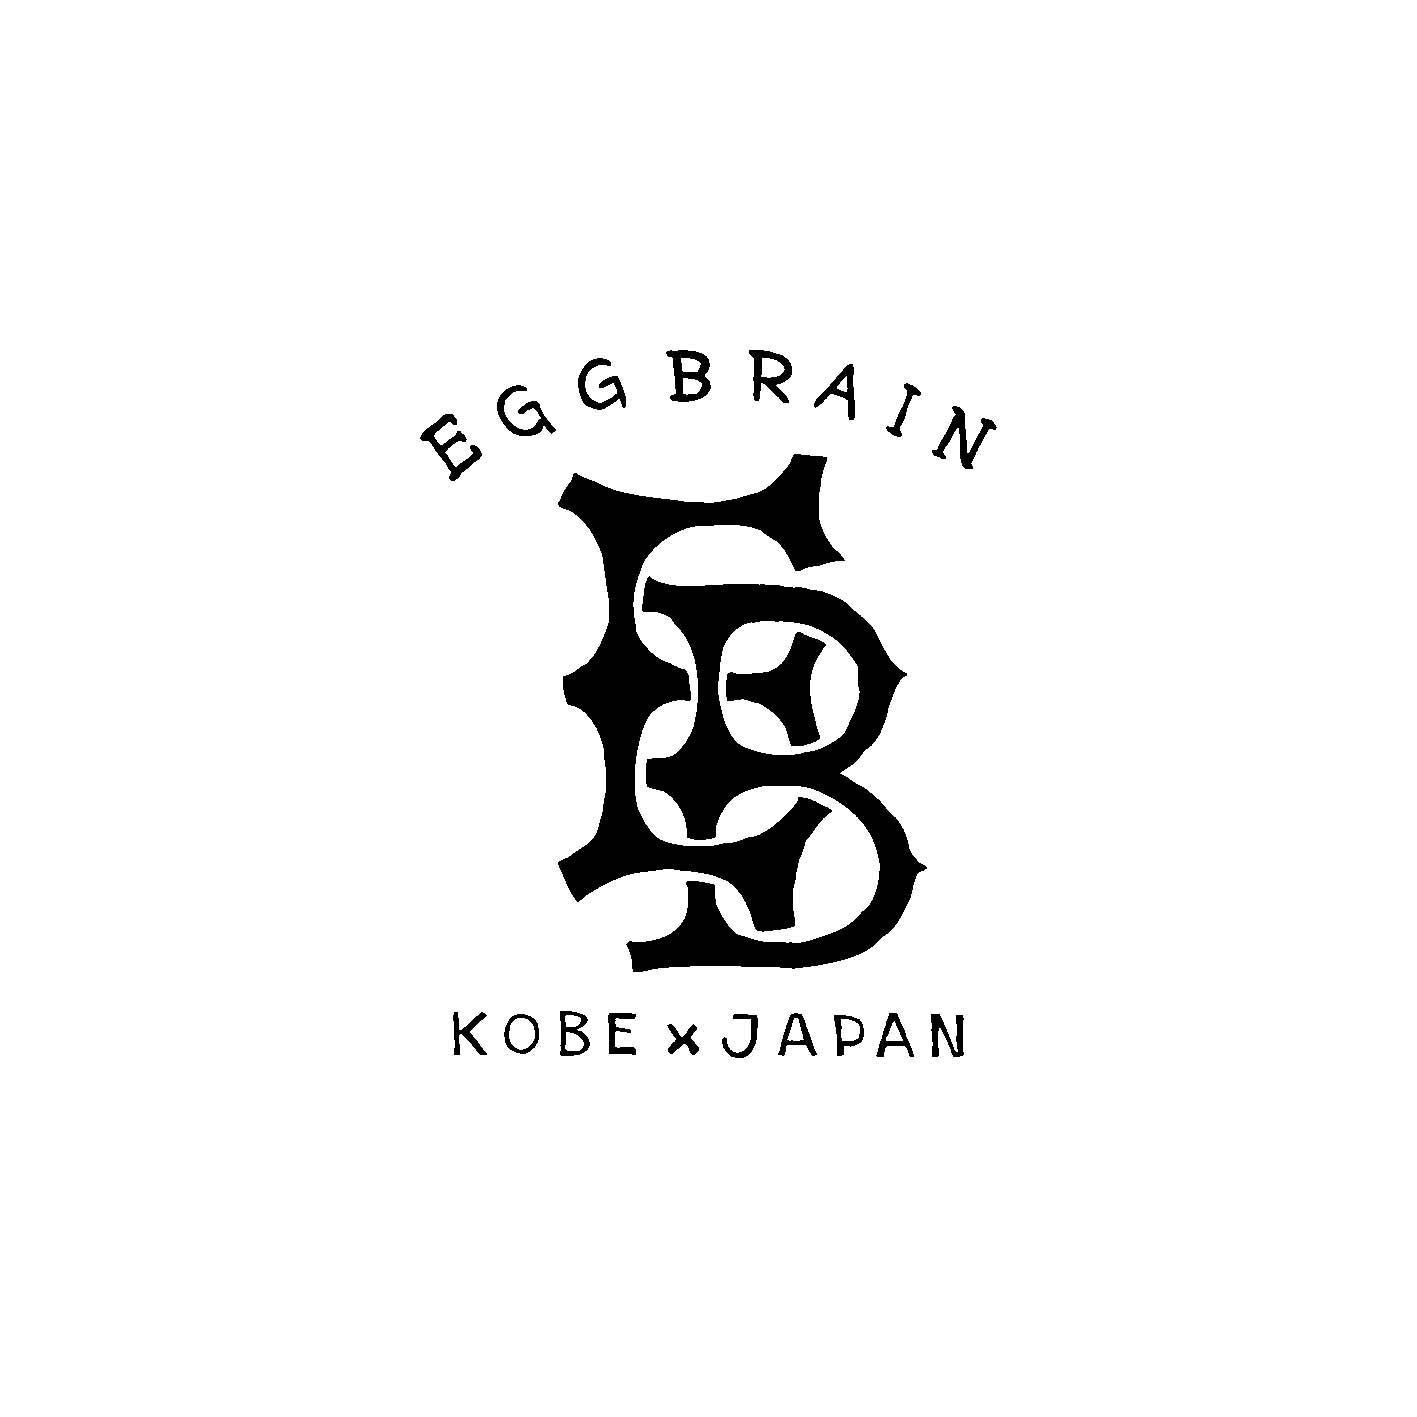 EGG BRAIN / emblem